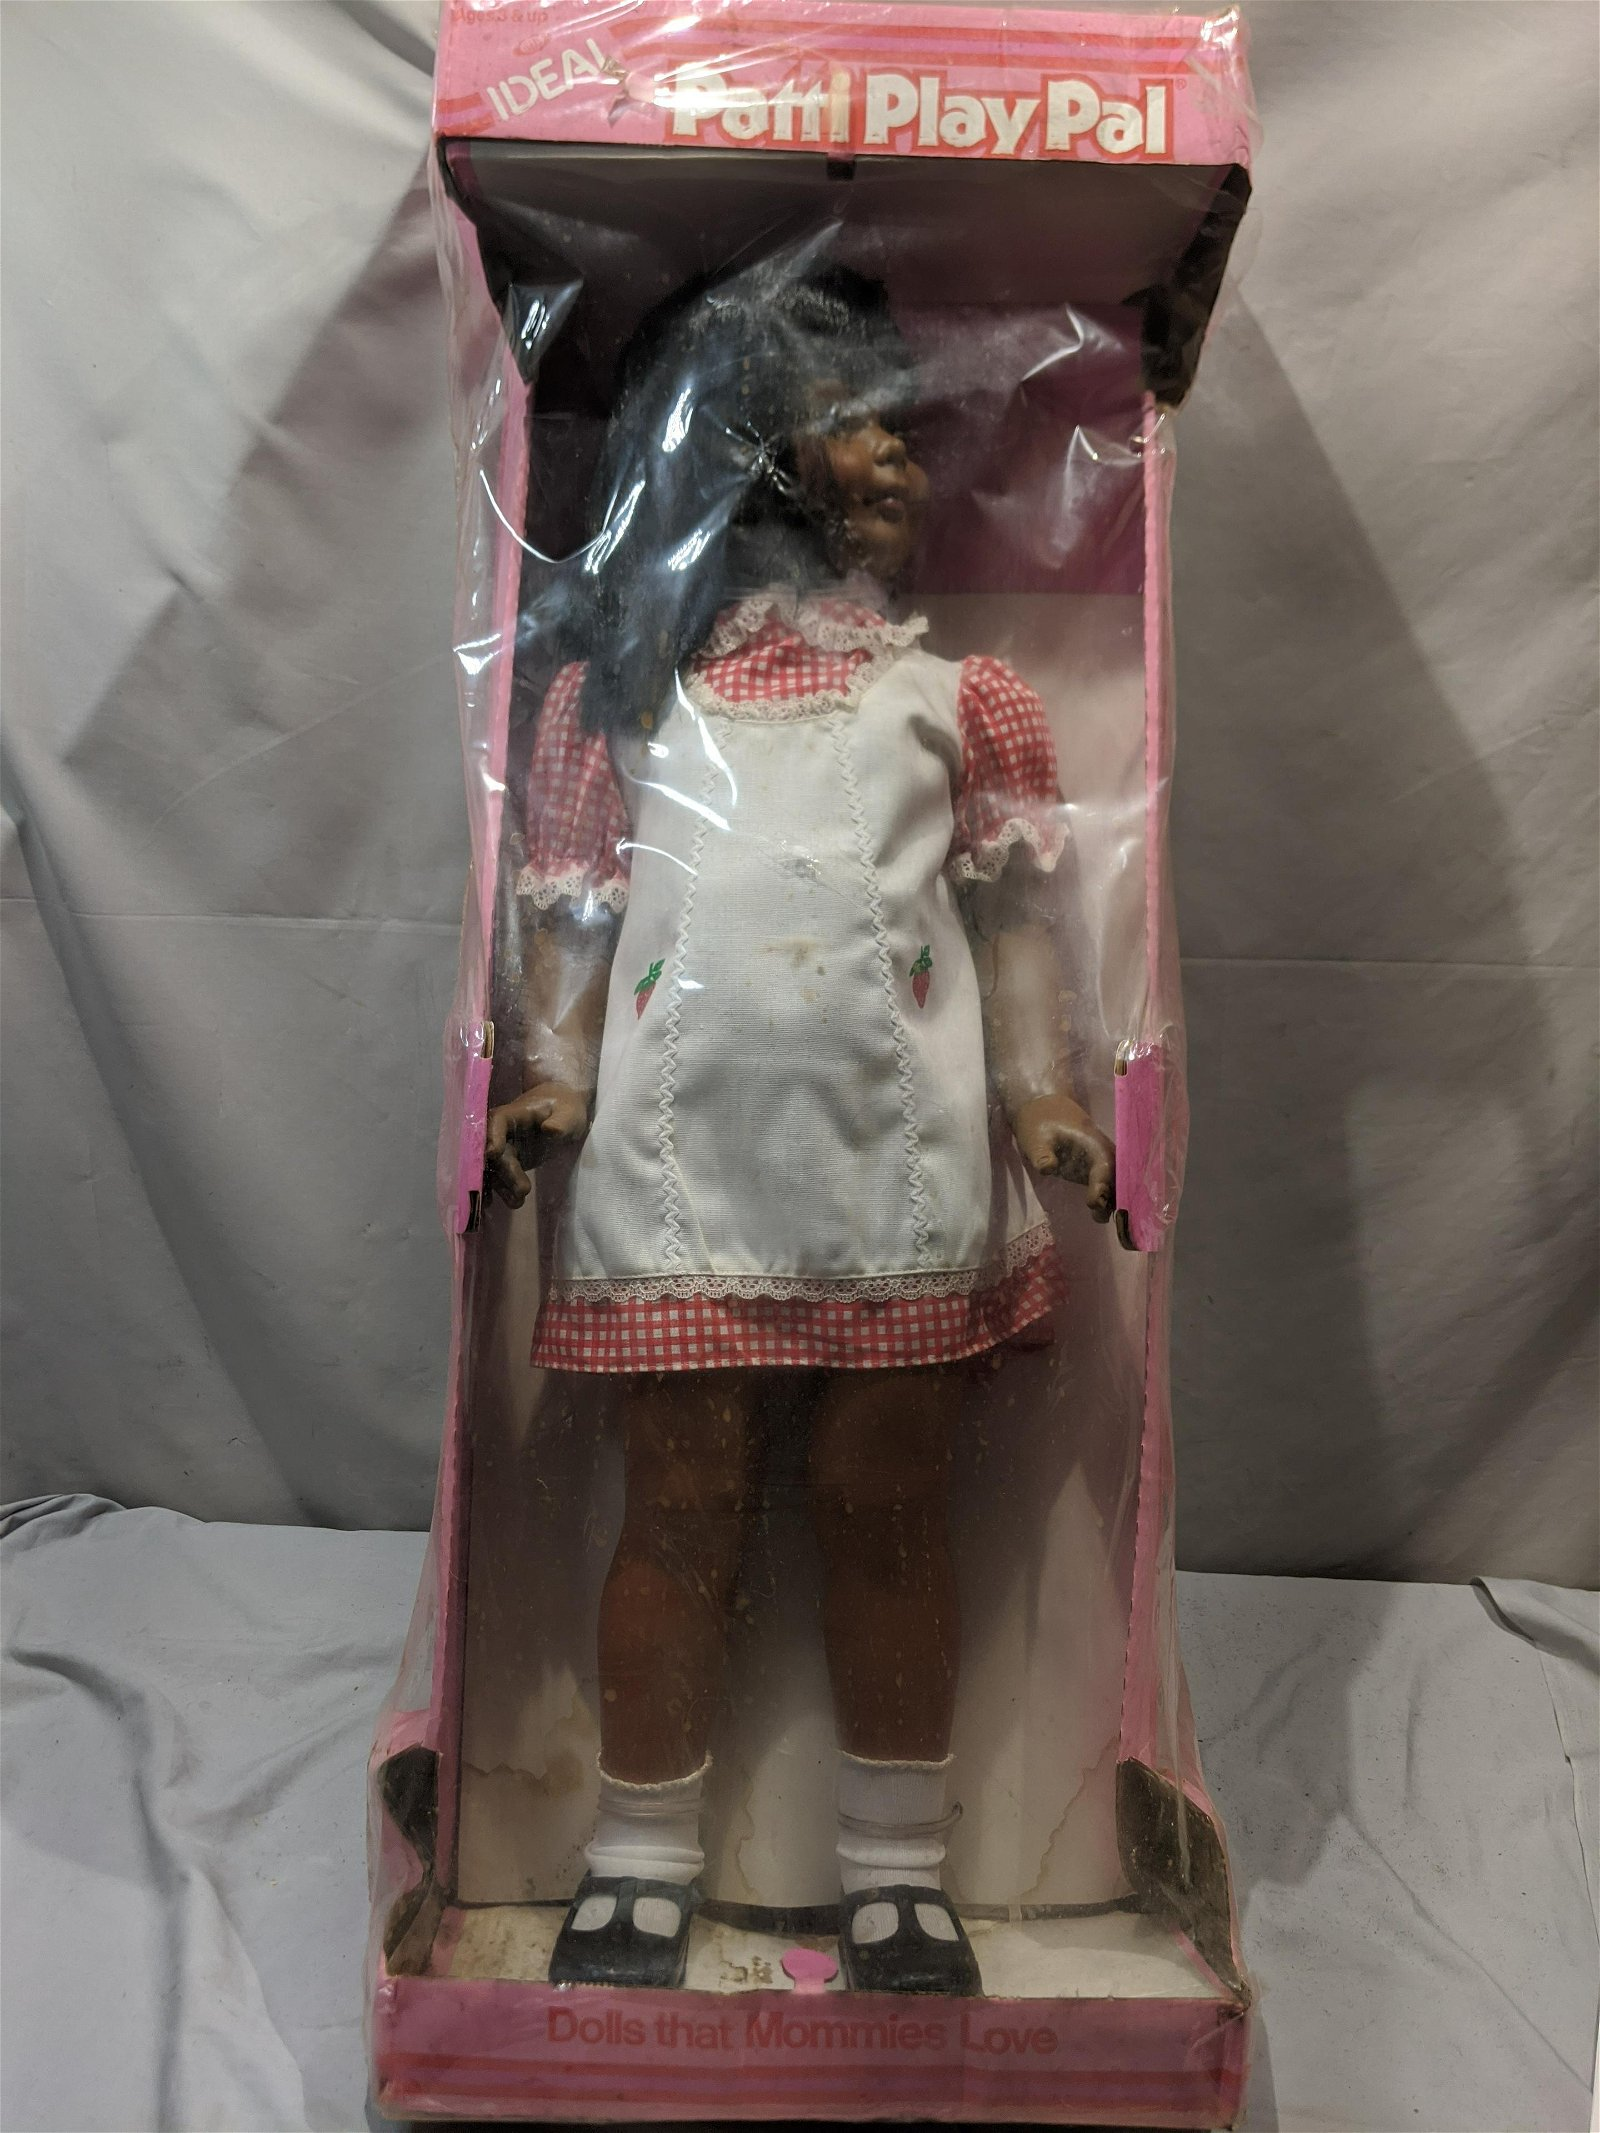 1981 Ideal Patti Play Pal Black Girl Doll in Box